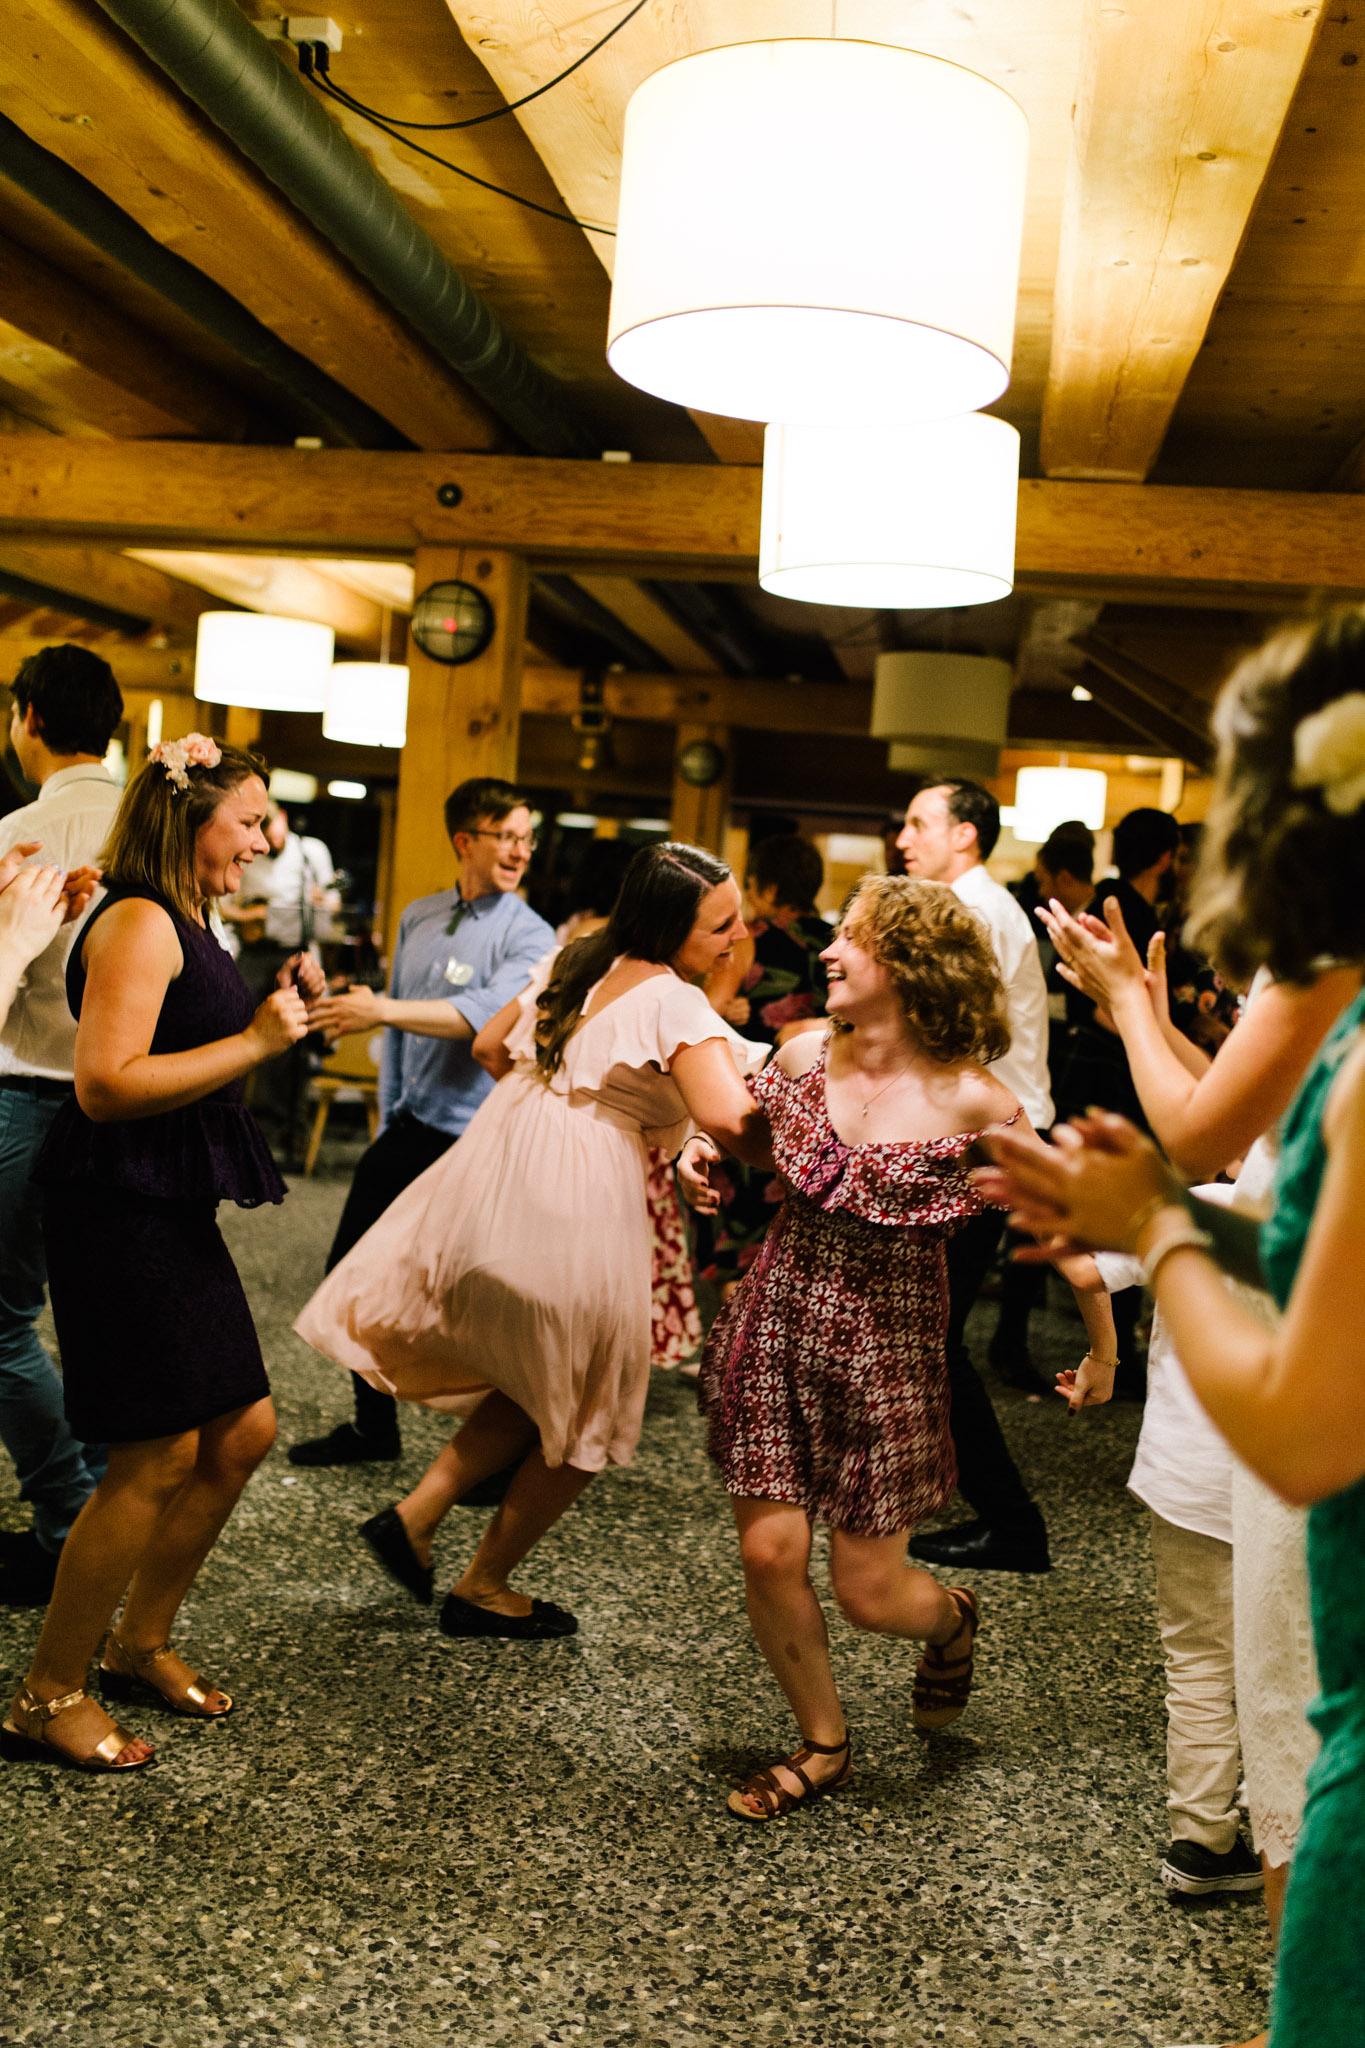 Lenl-Simmental-Buehlerhof-Pia-Anna-Christian-Wedding-Photography-EK-101.jpg